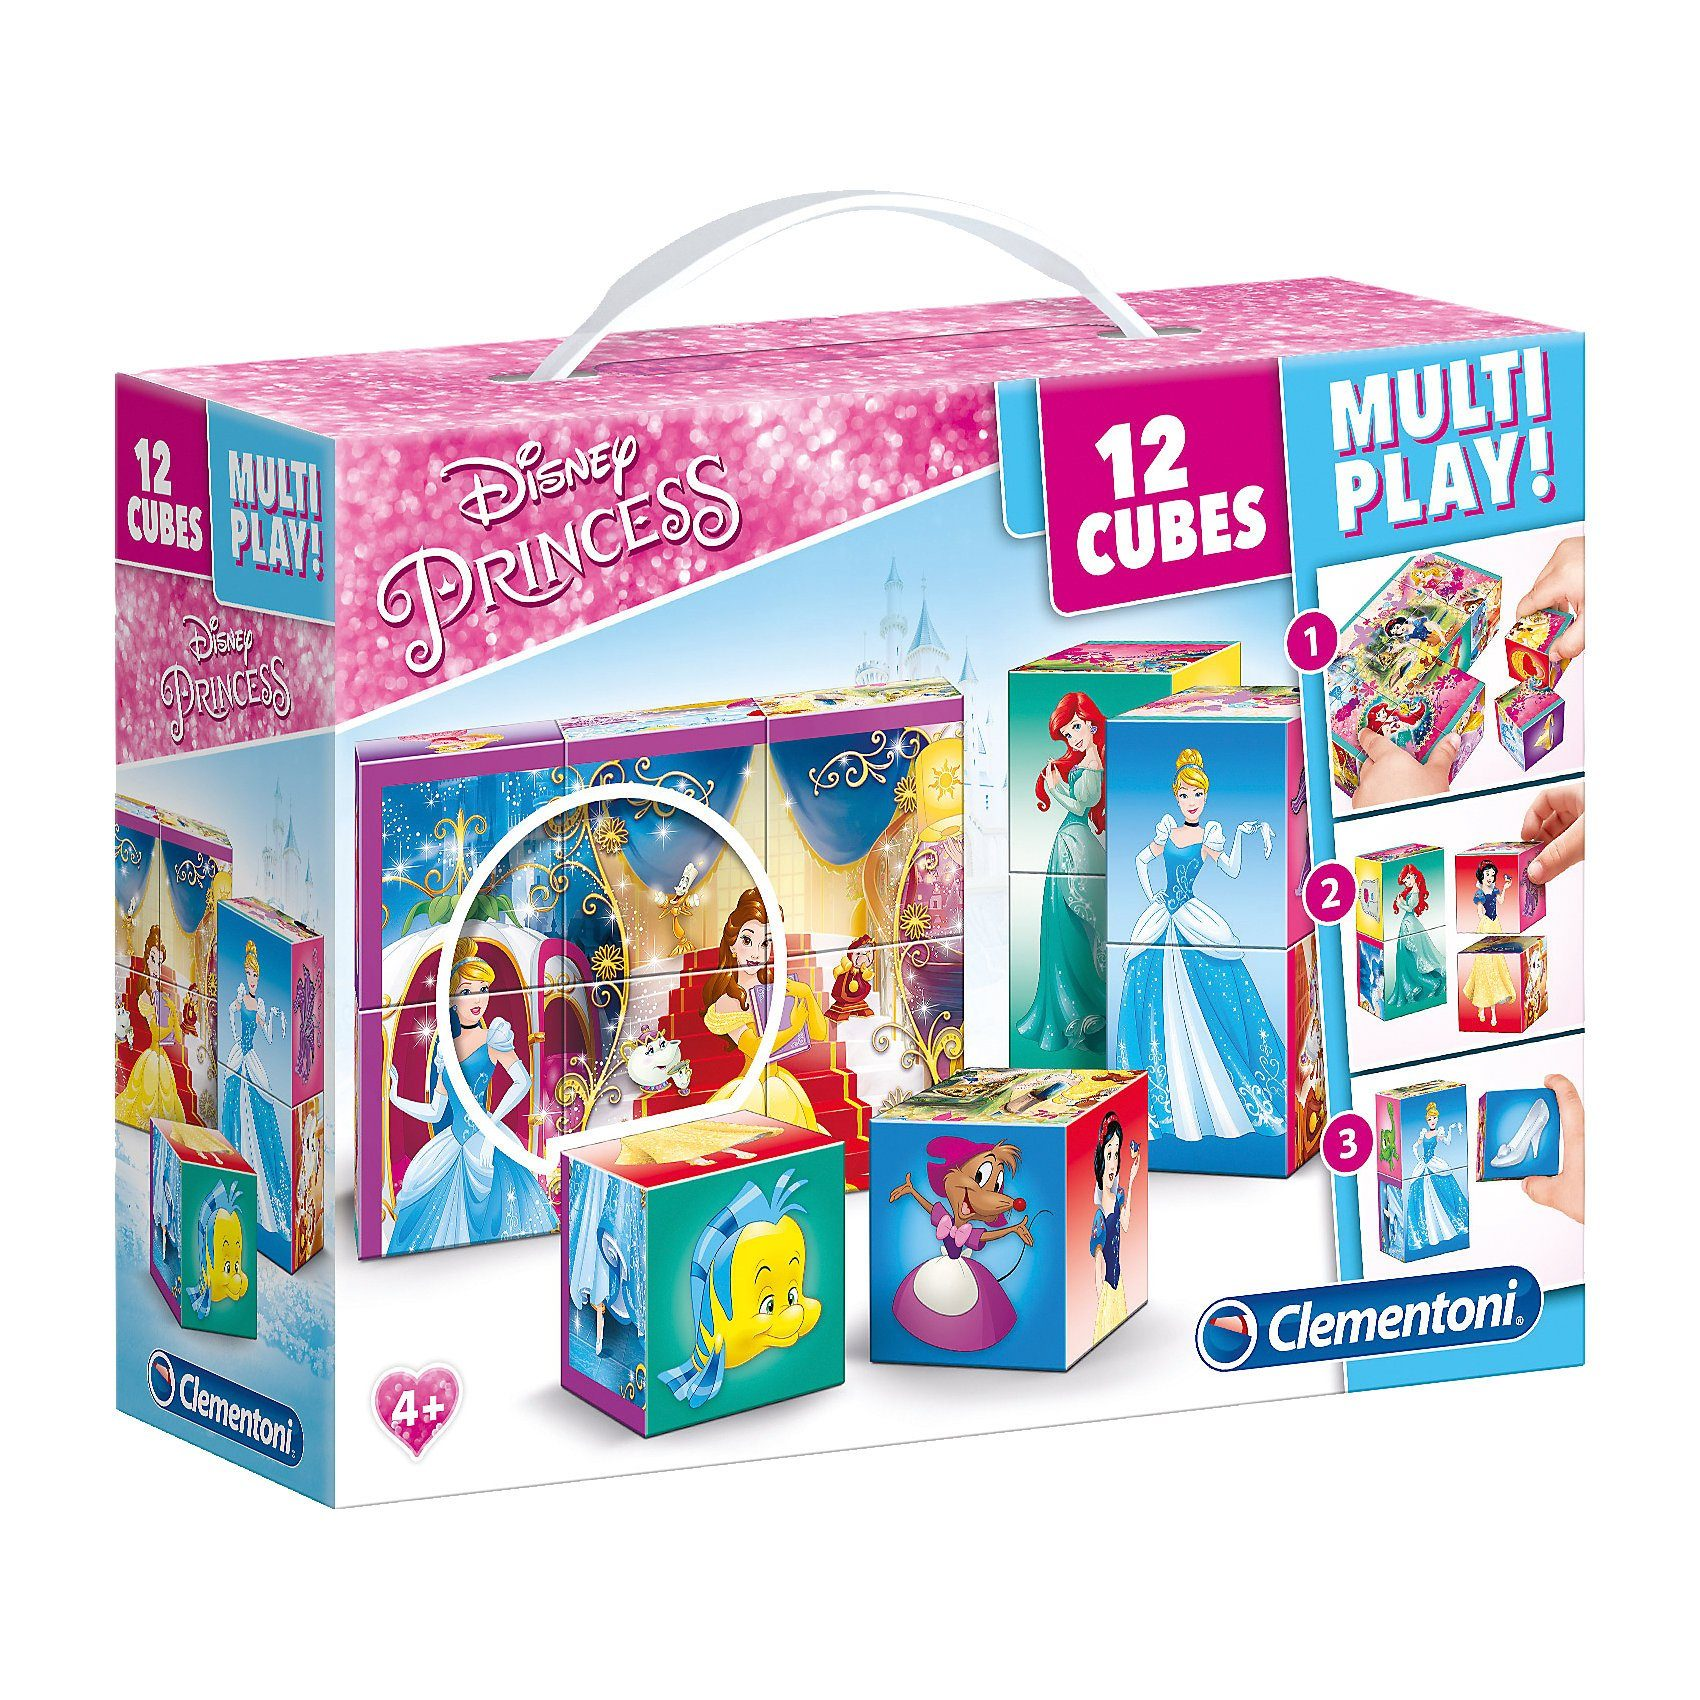 Clementoni® Würfelpuzzle 12er Multiplay - Disney Princess